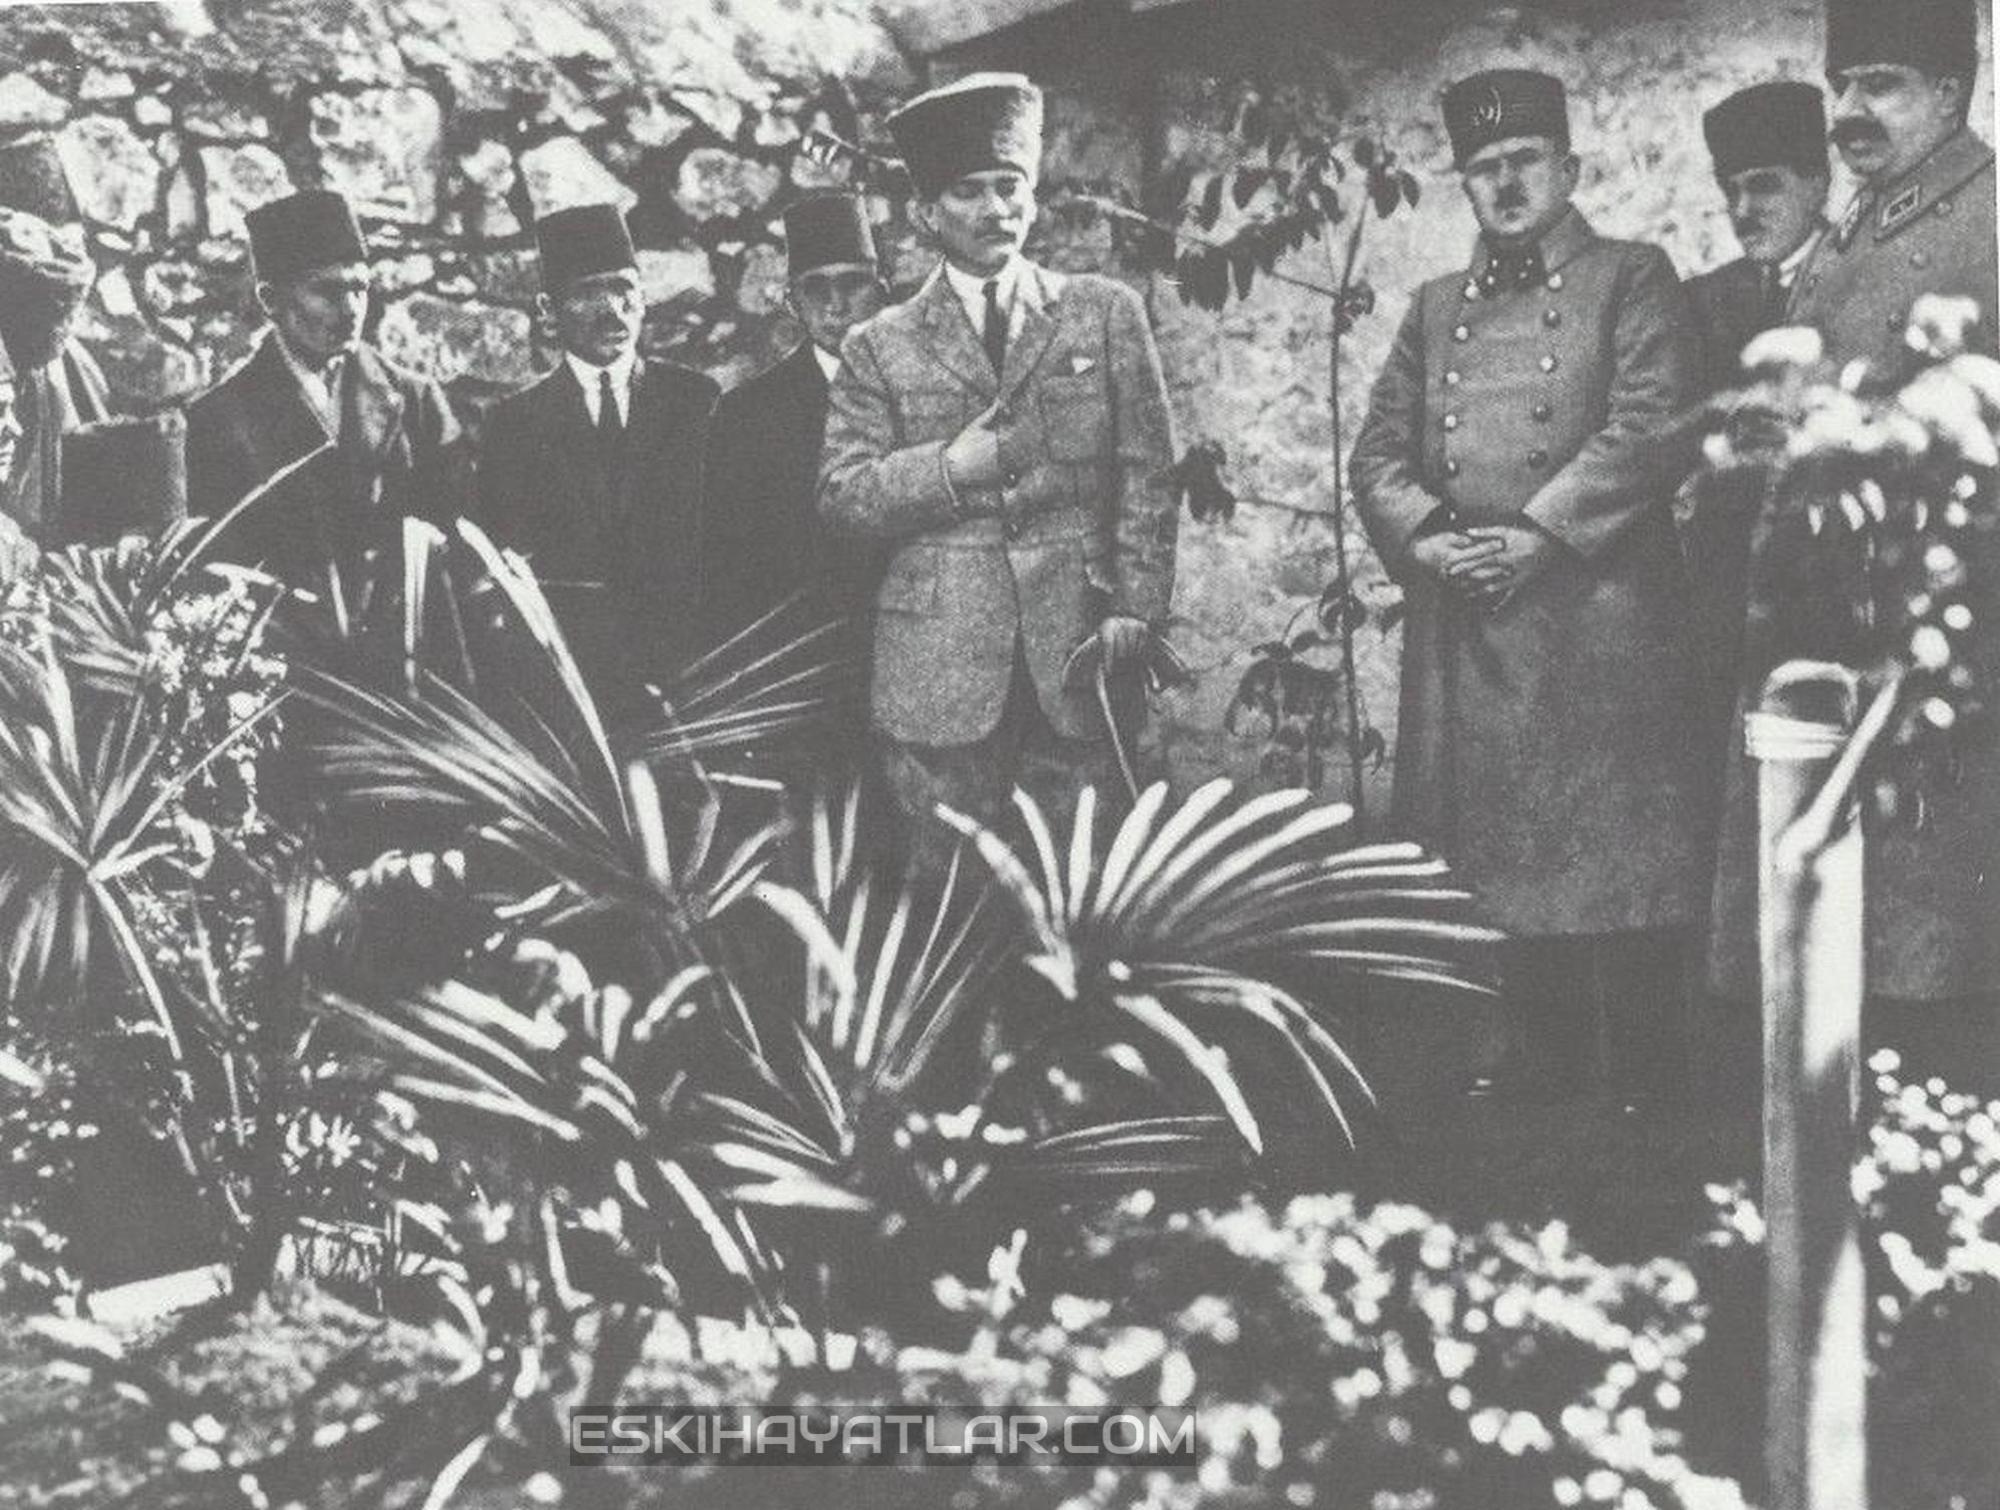 ataturk-izmir-gunleri-mustafa-kemal-pasa-1922-izmir-fotograflari (12)